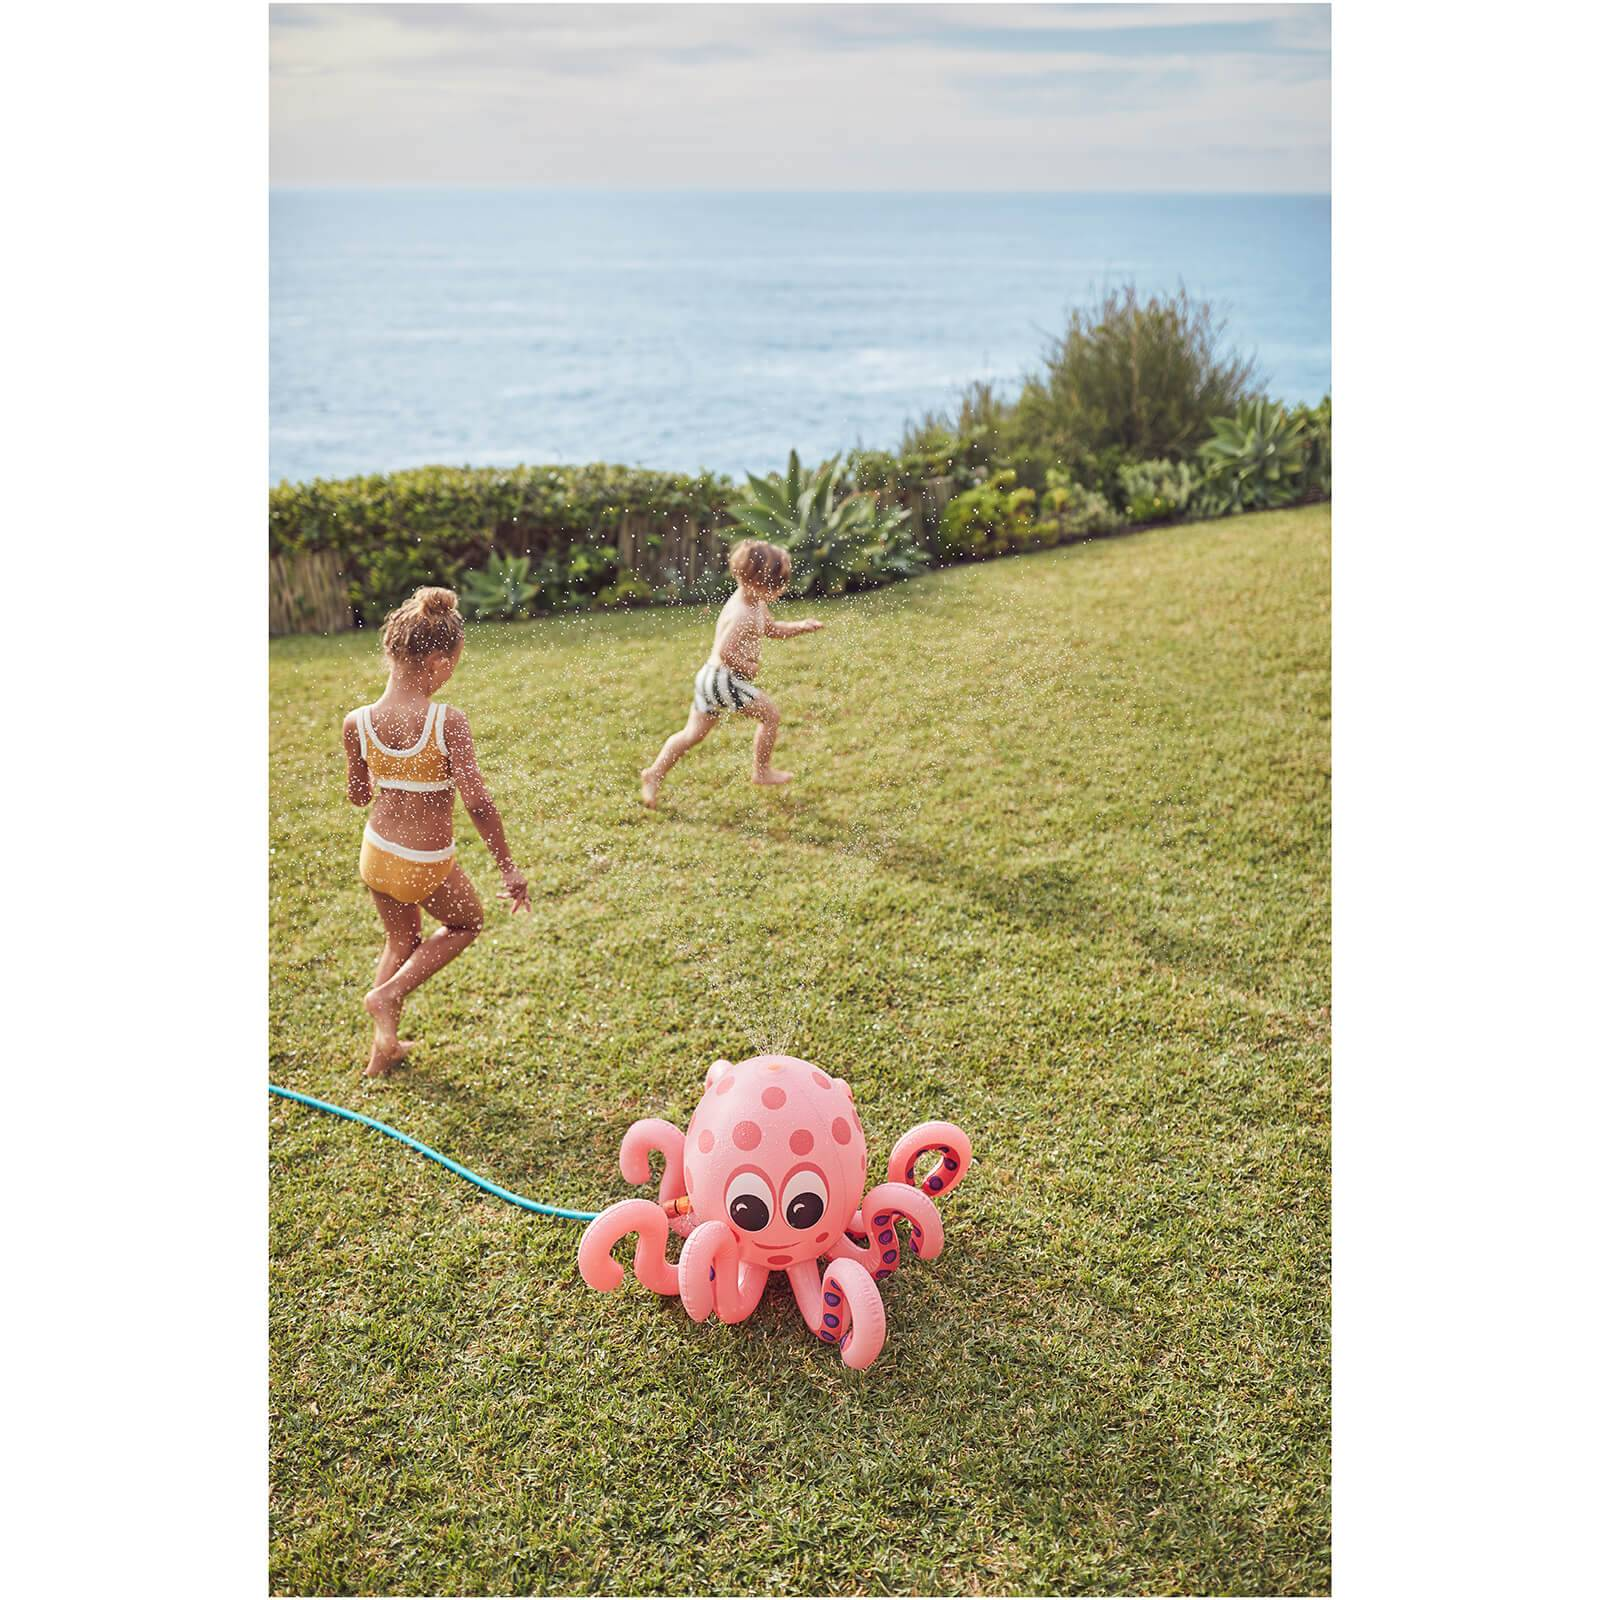 Sunnylife Inflatable Octopus Sprinkler - Pink